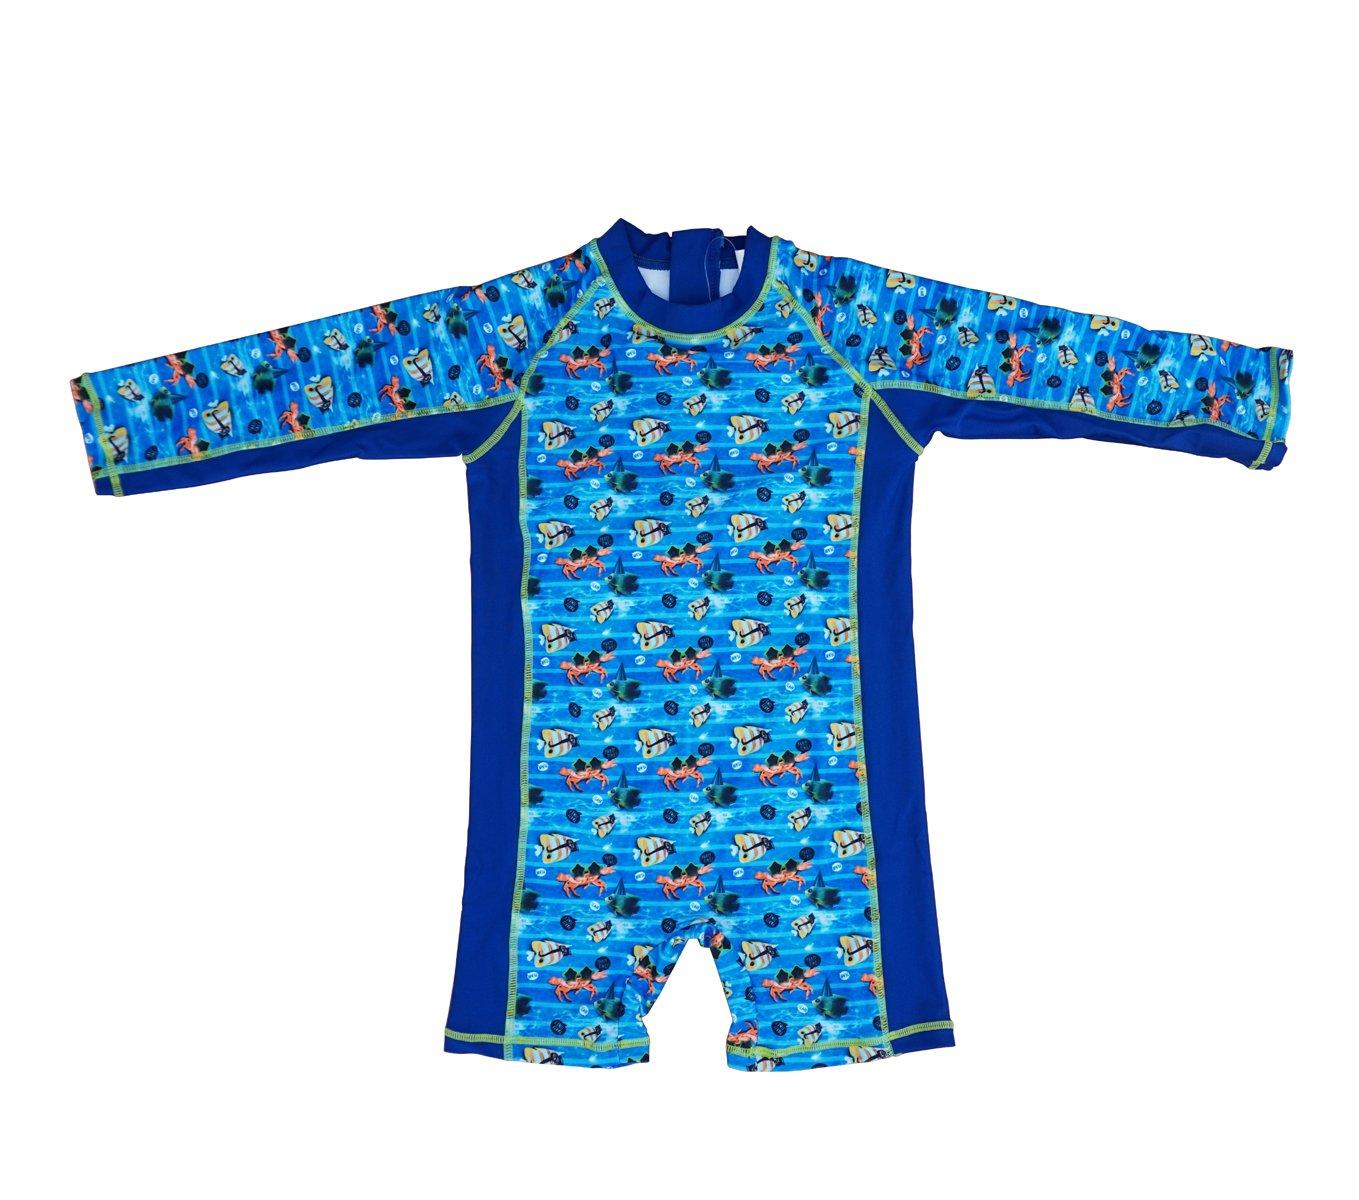 Bonverano(TM) Infant Boy's UPF 50+ Sun Protection